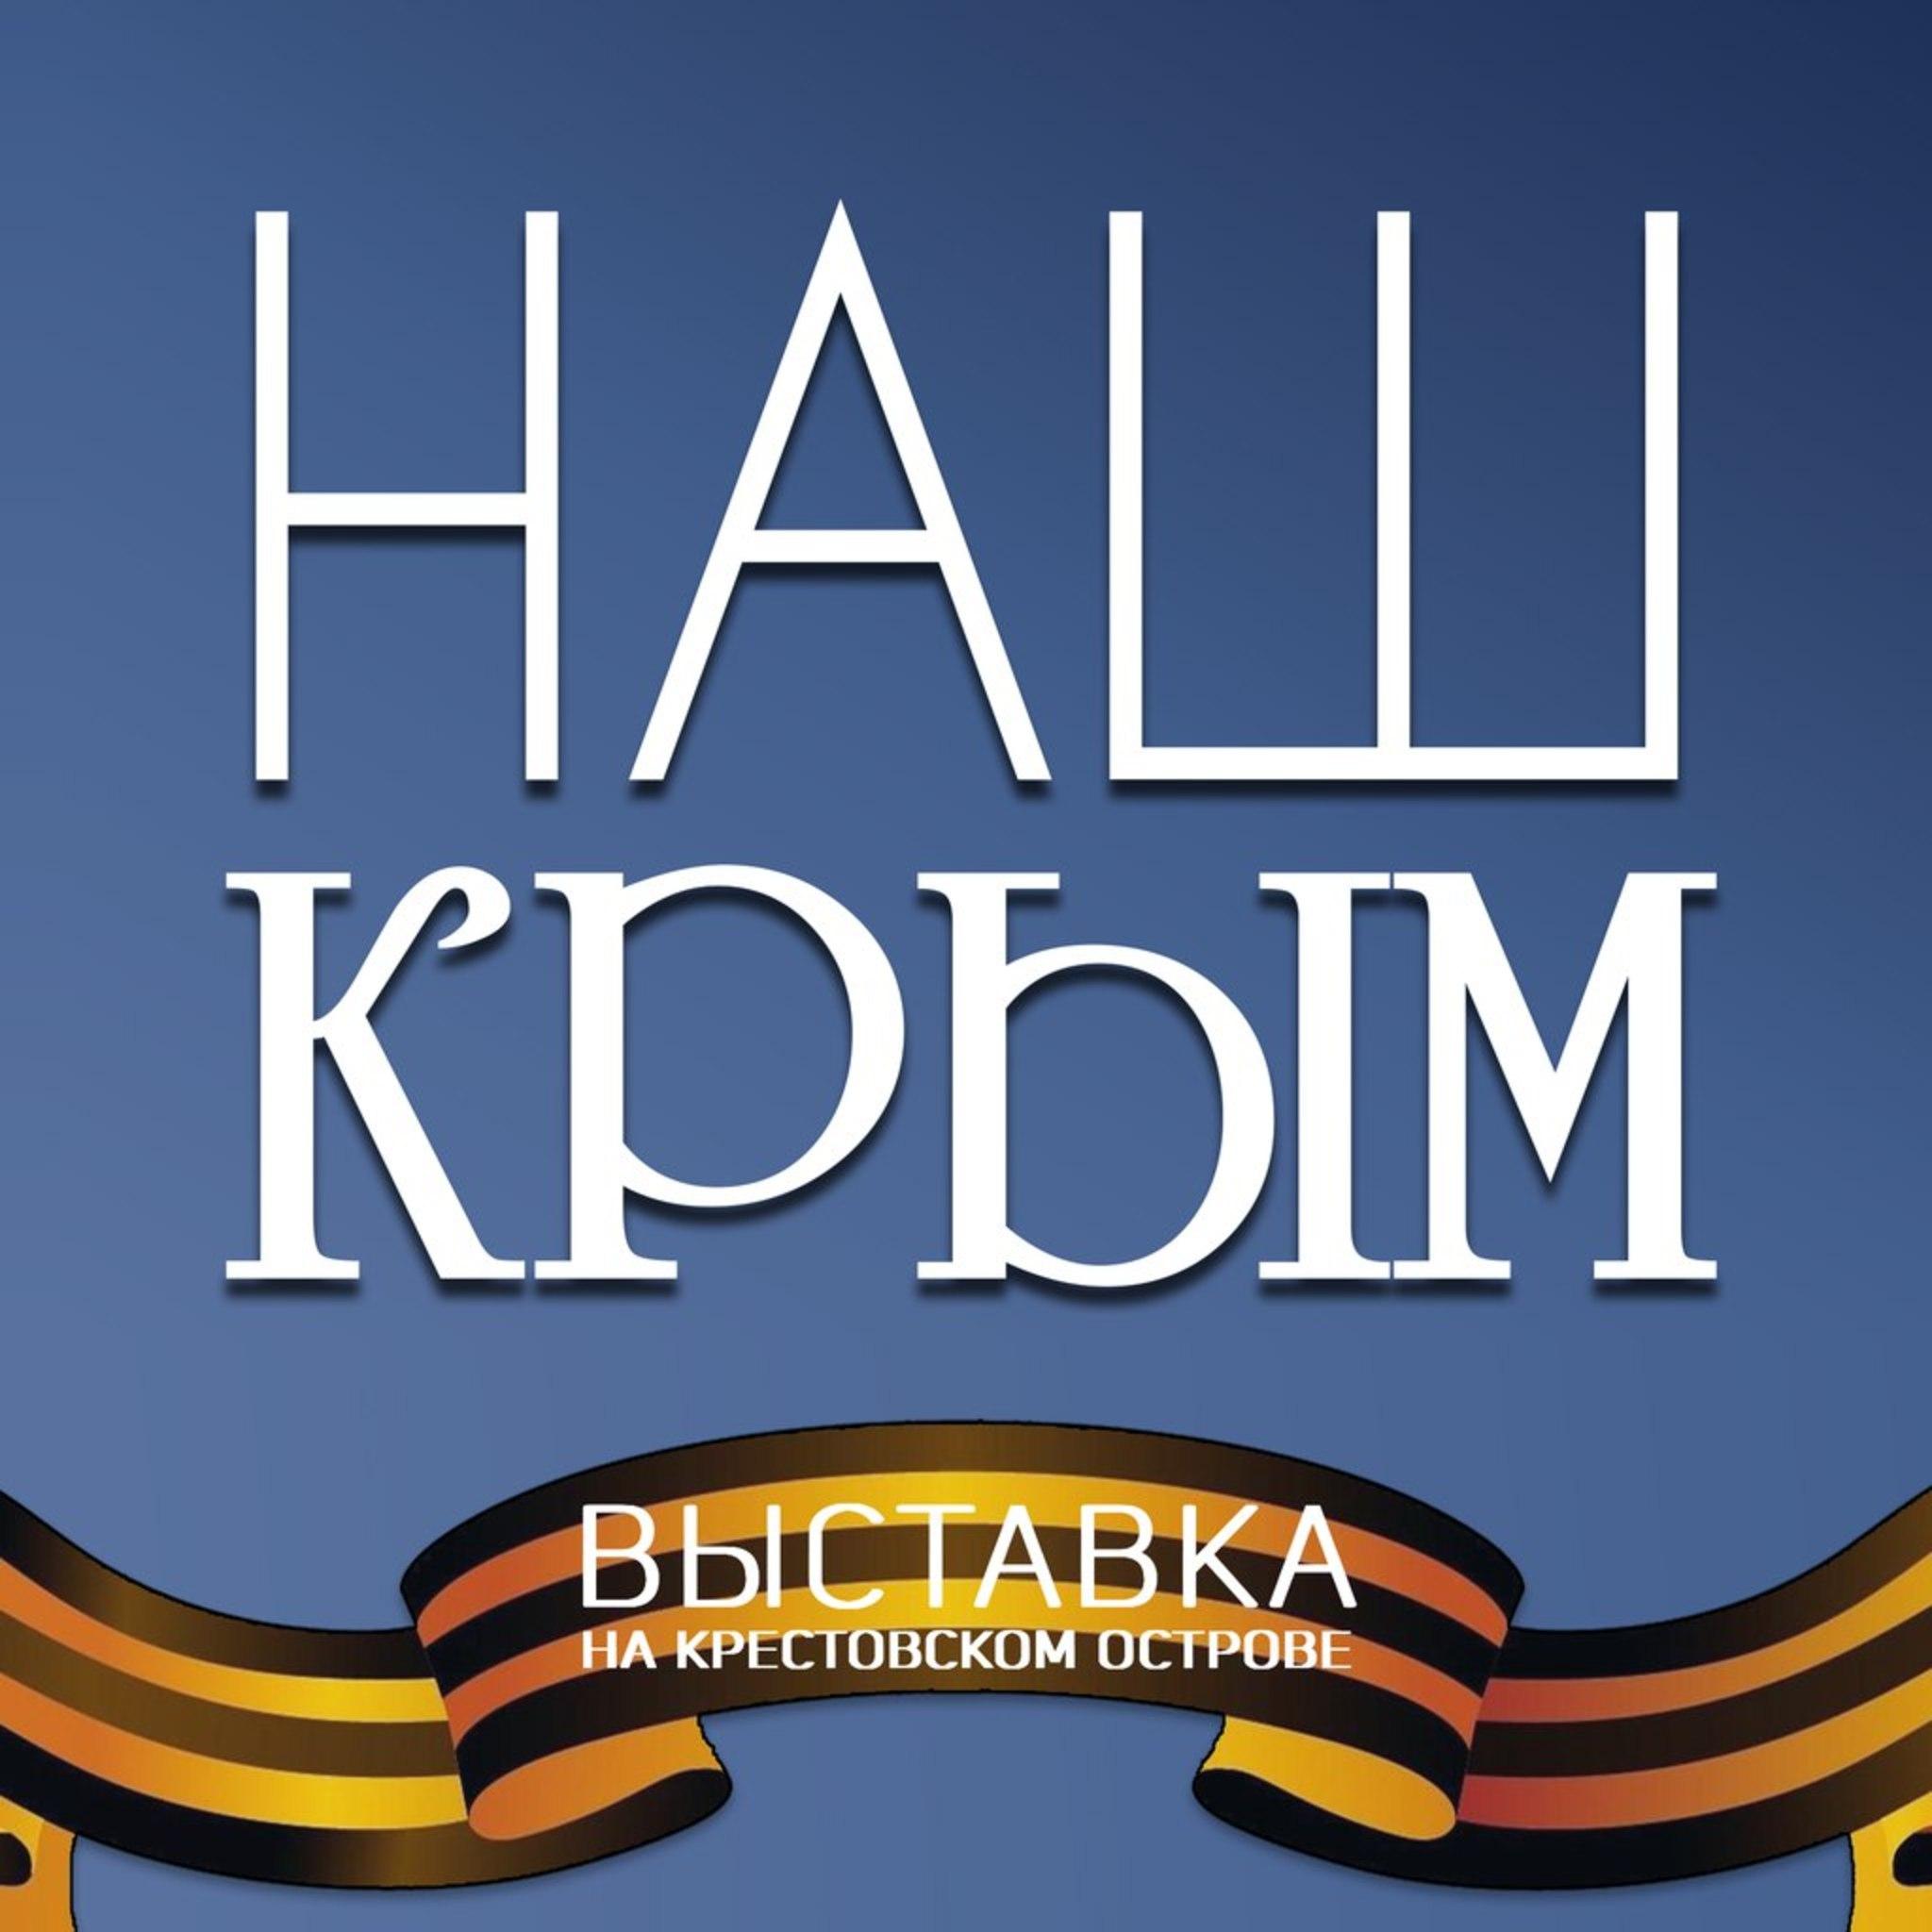 The exhibition Our Crimea